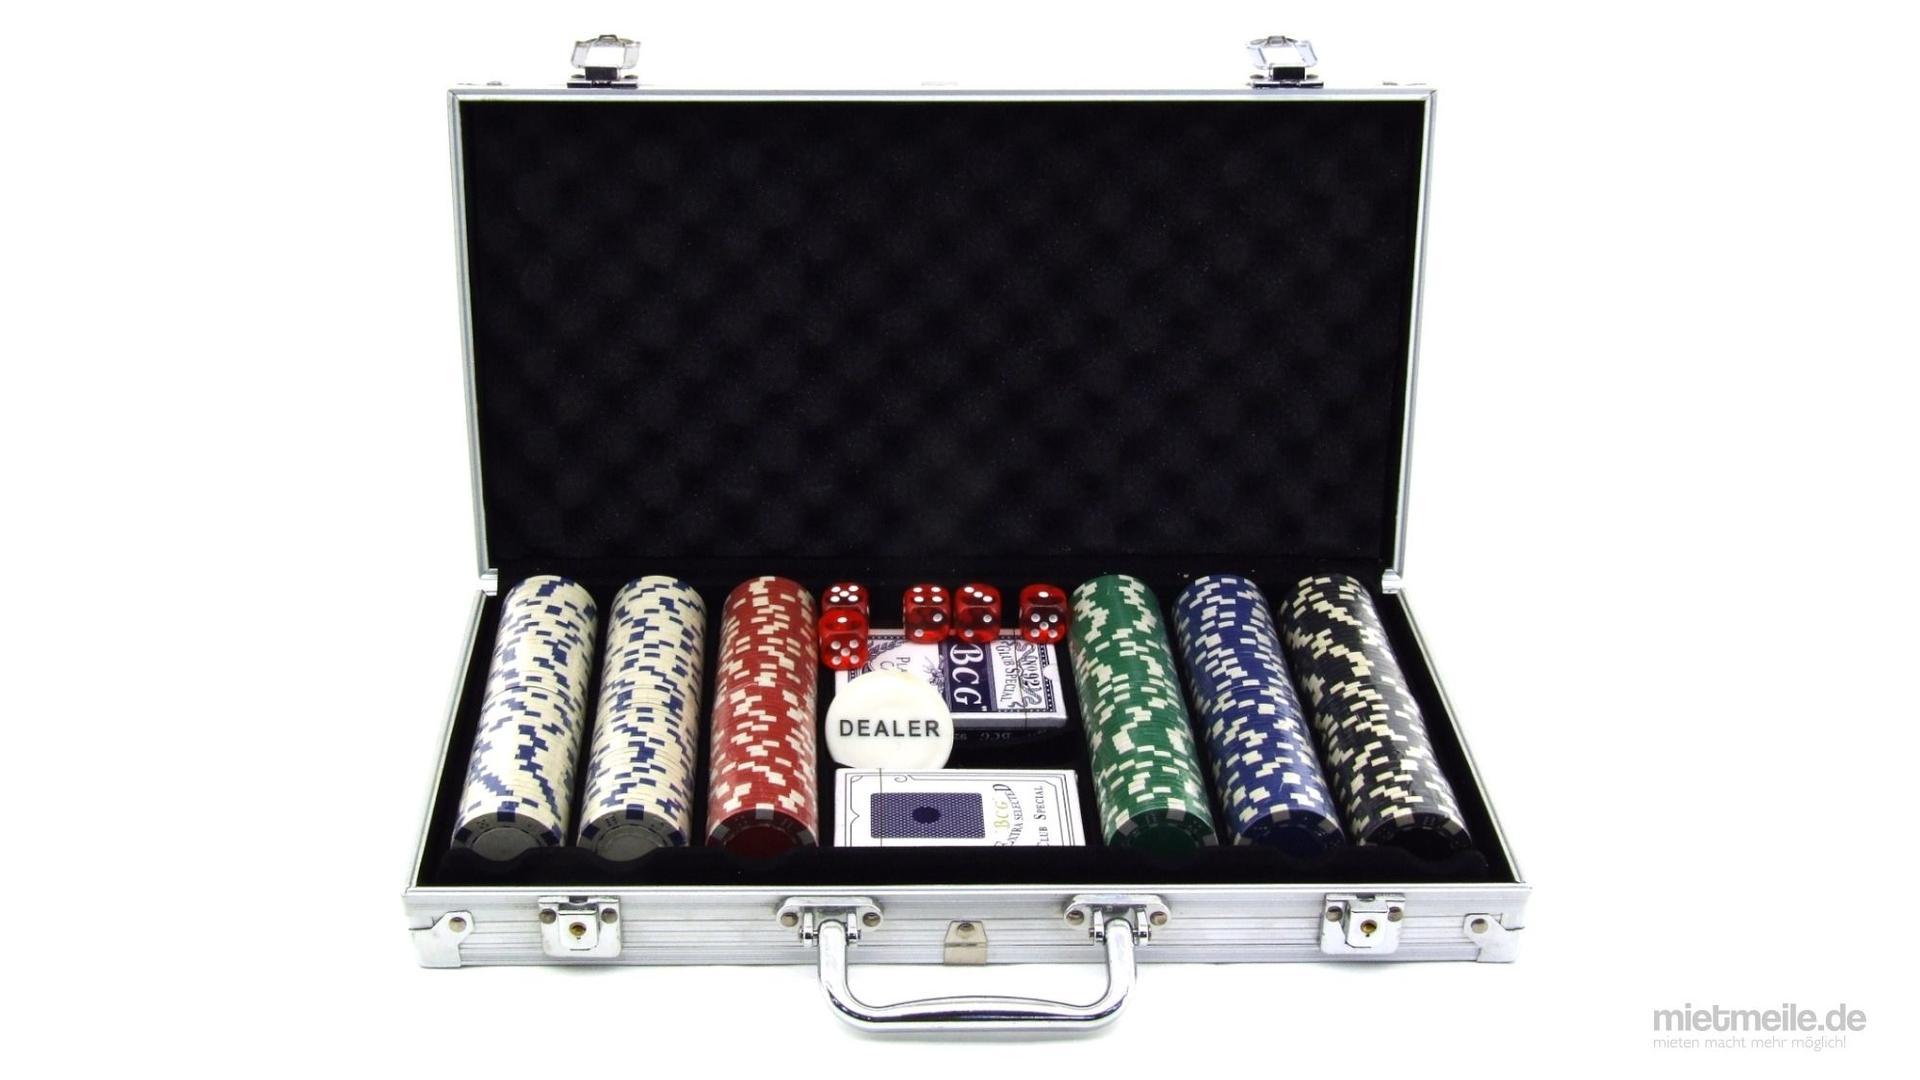 Gewinnspiele mieten & vermieten - Poker-Set Pokerkoffer Poker-Chips Spielkarten in Schkeuditz